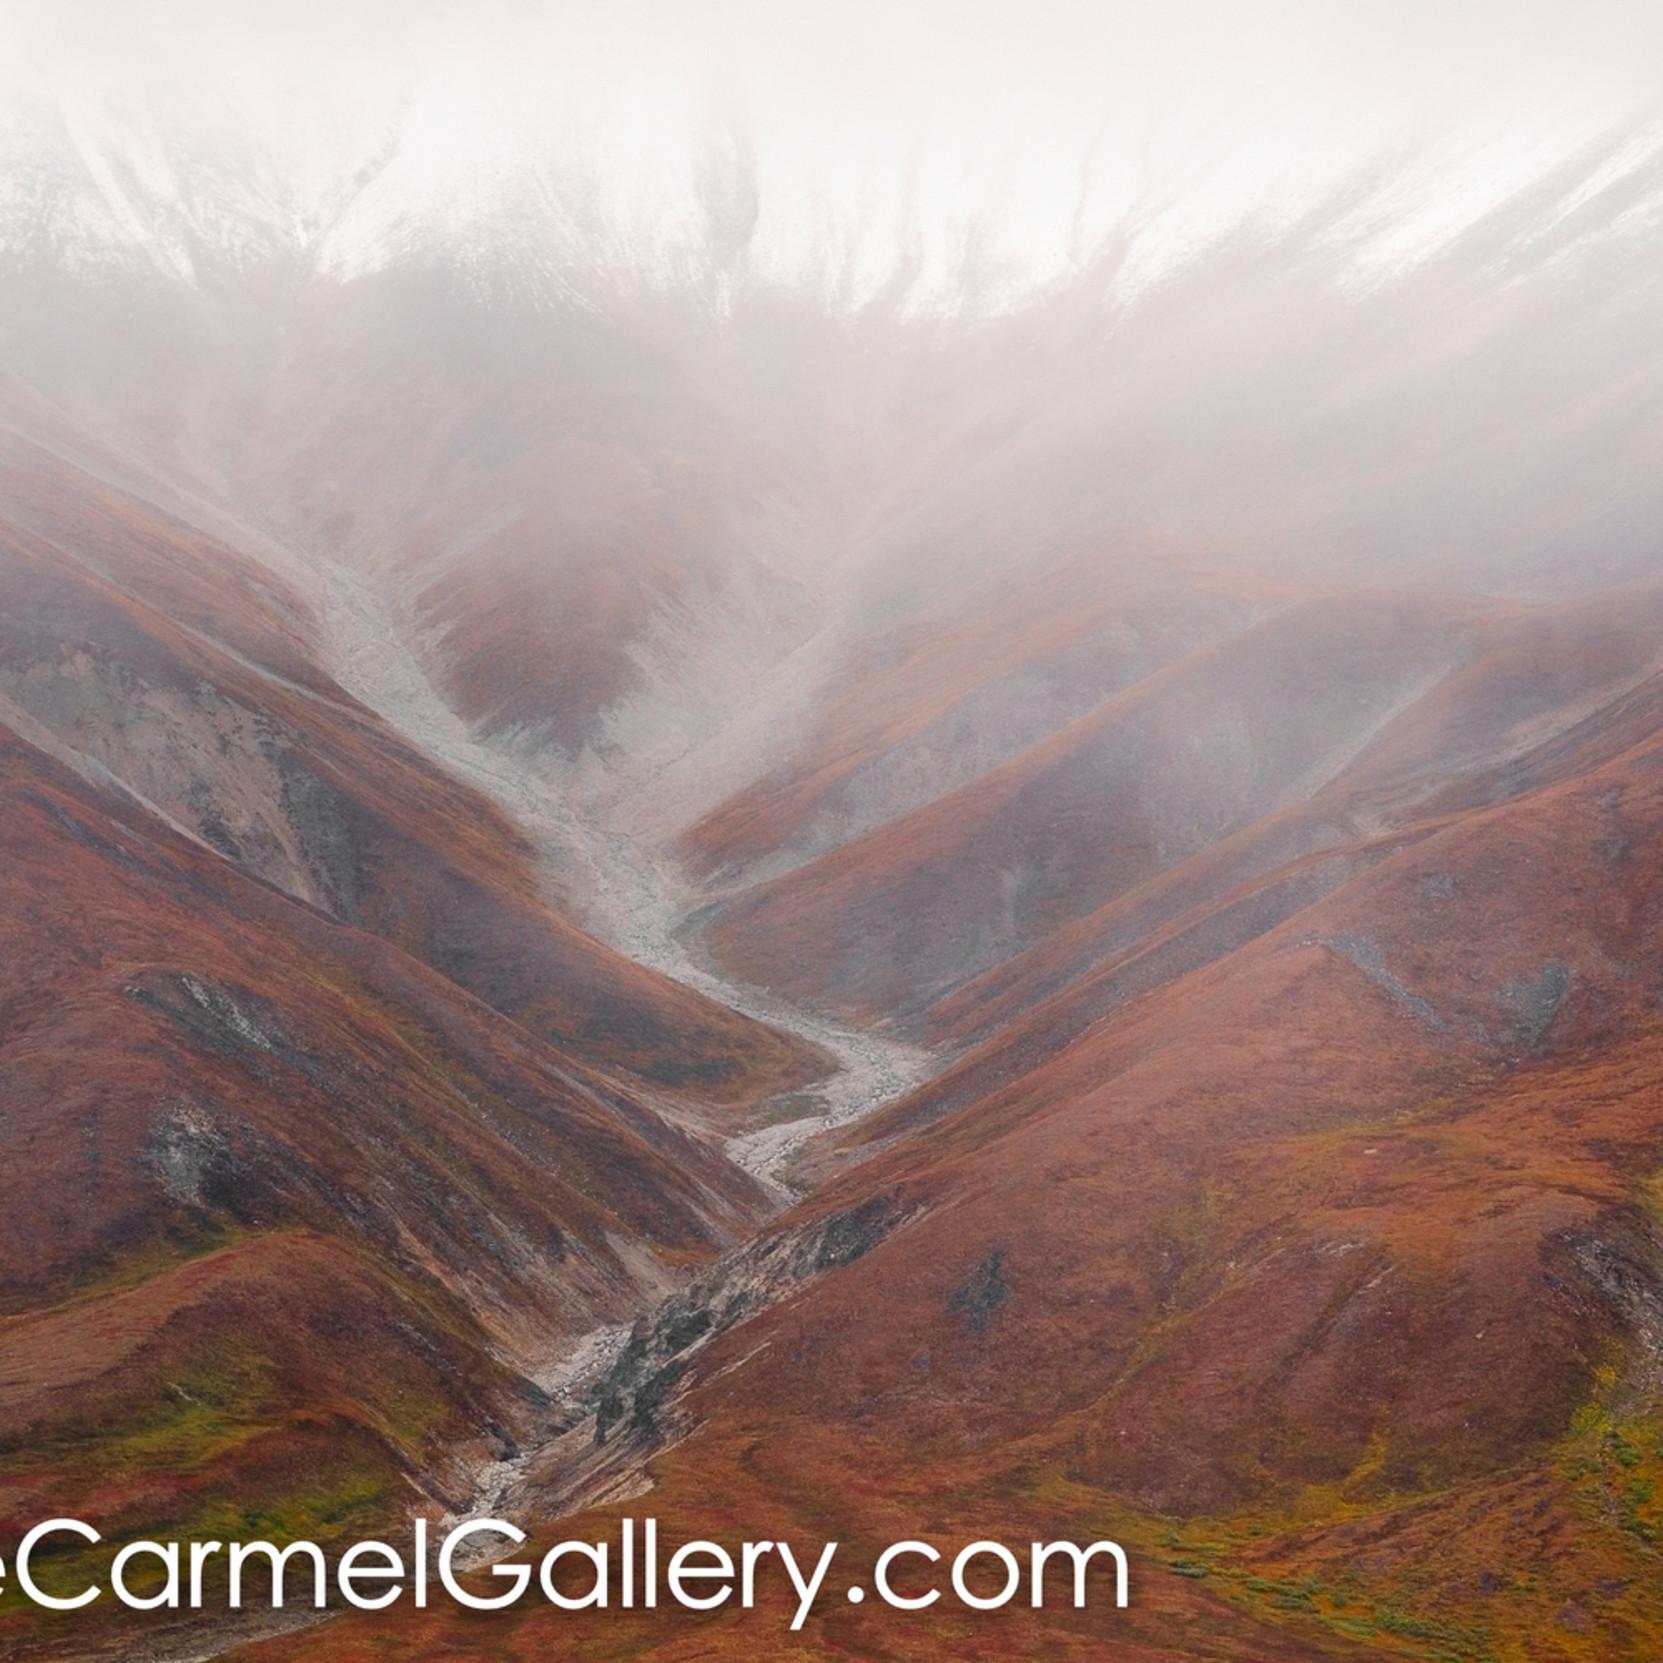 Autumn mist wjxxed